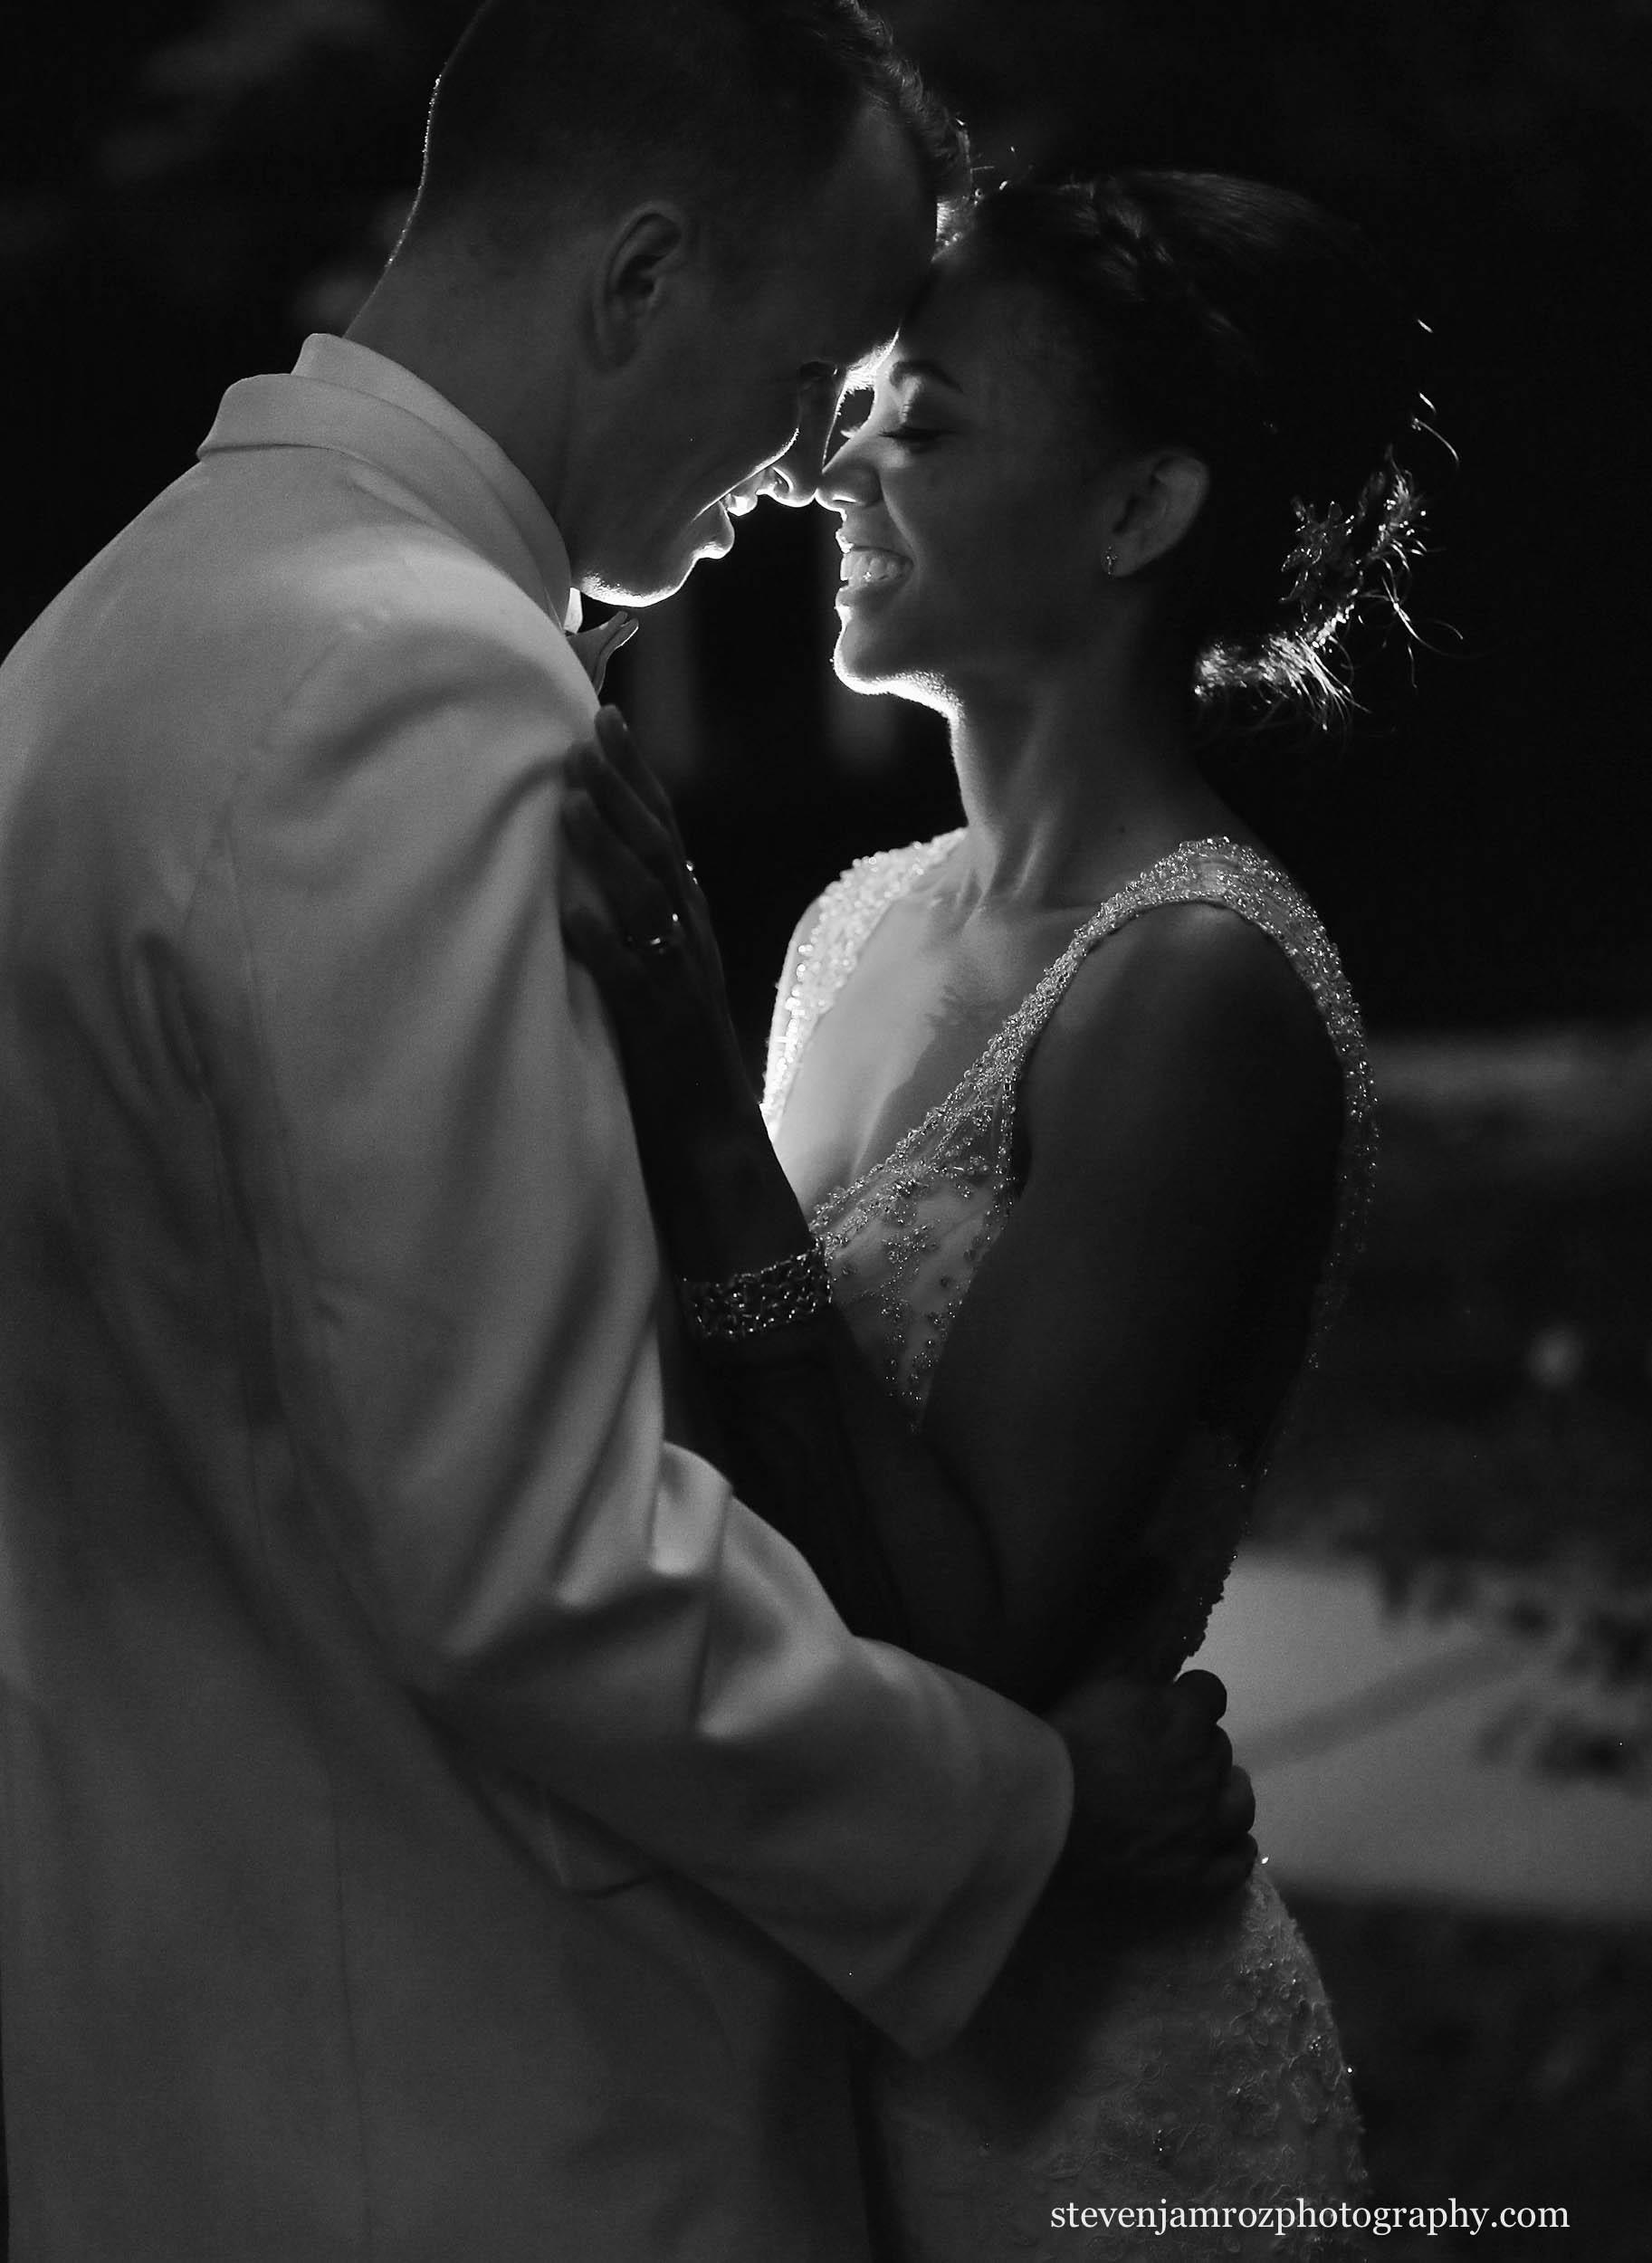 lantern-portrait-hudson-manor-wedding-steven-jamroz-photography-0551.jpg